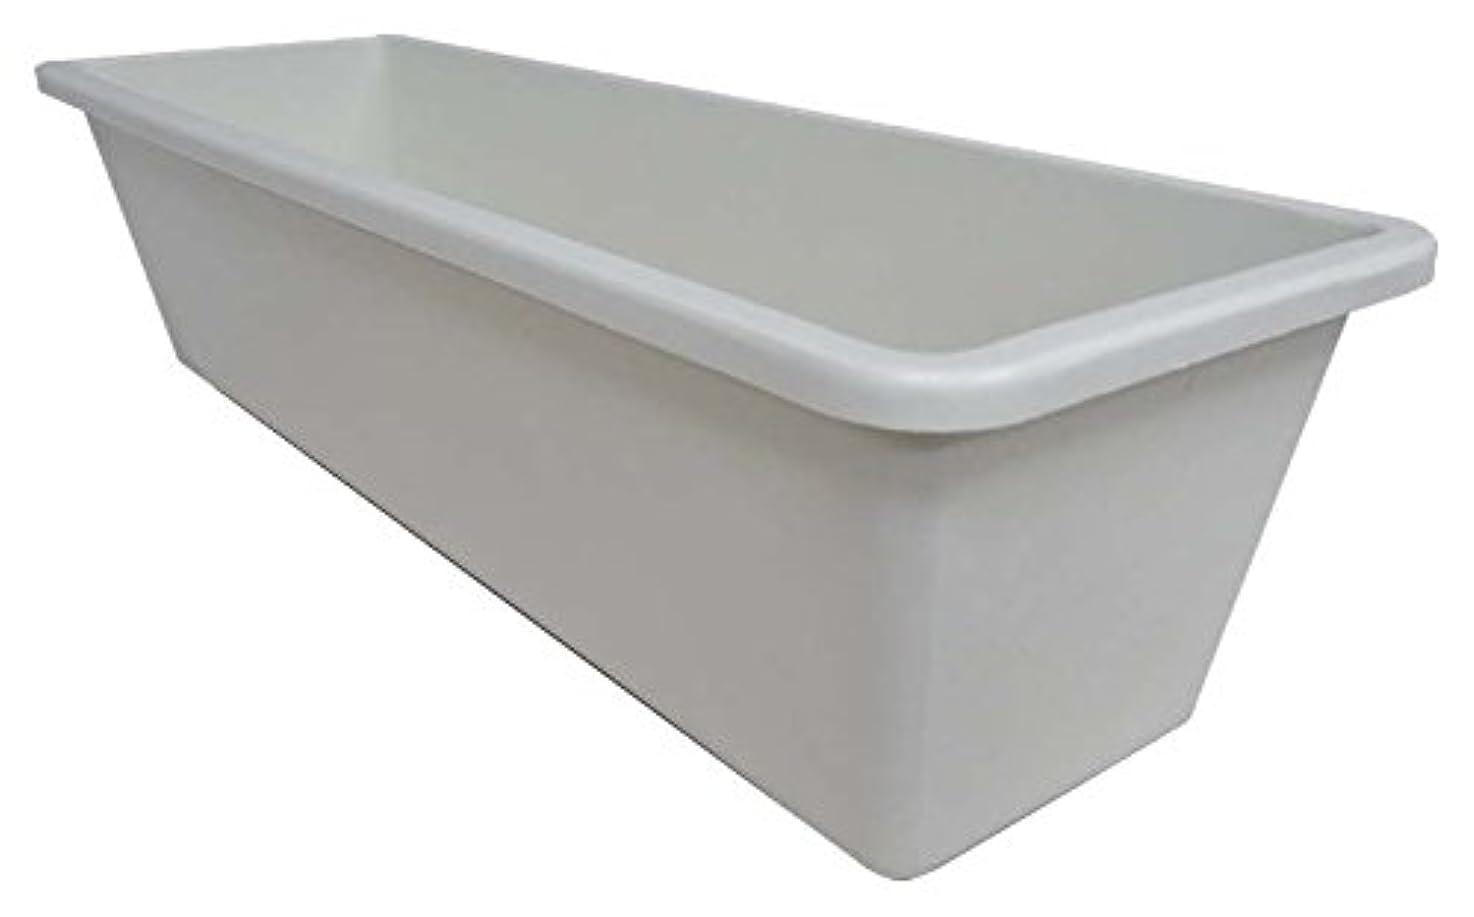 Toteline 1102085116 Nesting Grow Container, Glass Fiber Reinforced Plastic Composite, 24